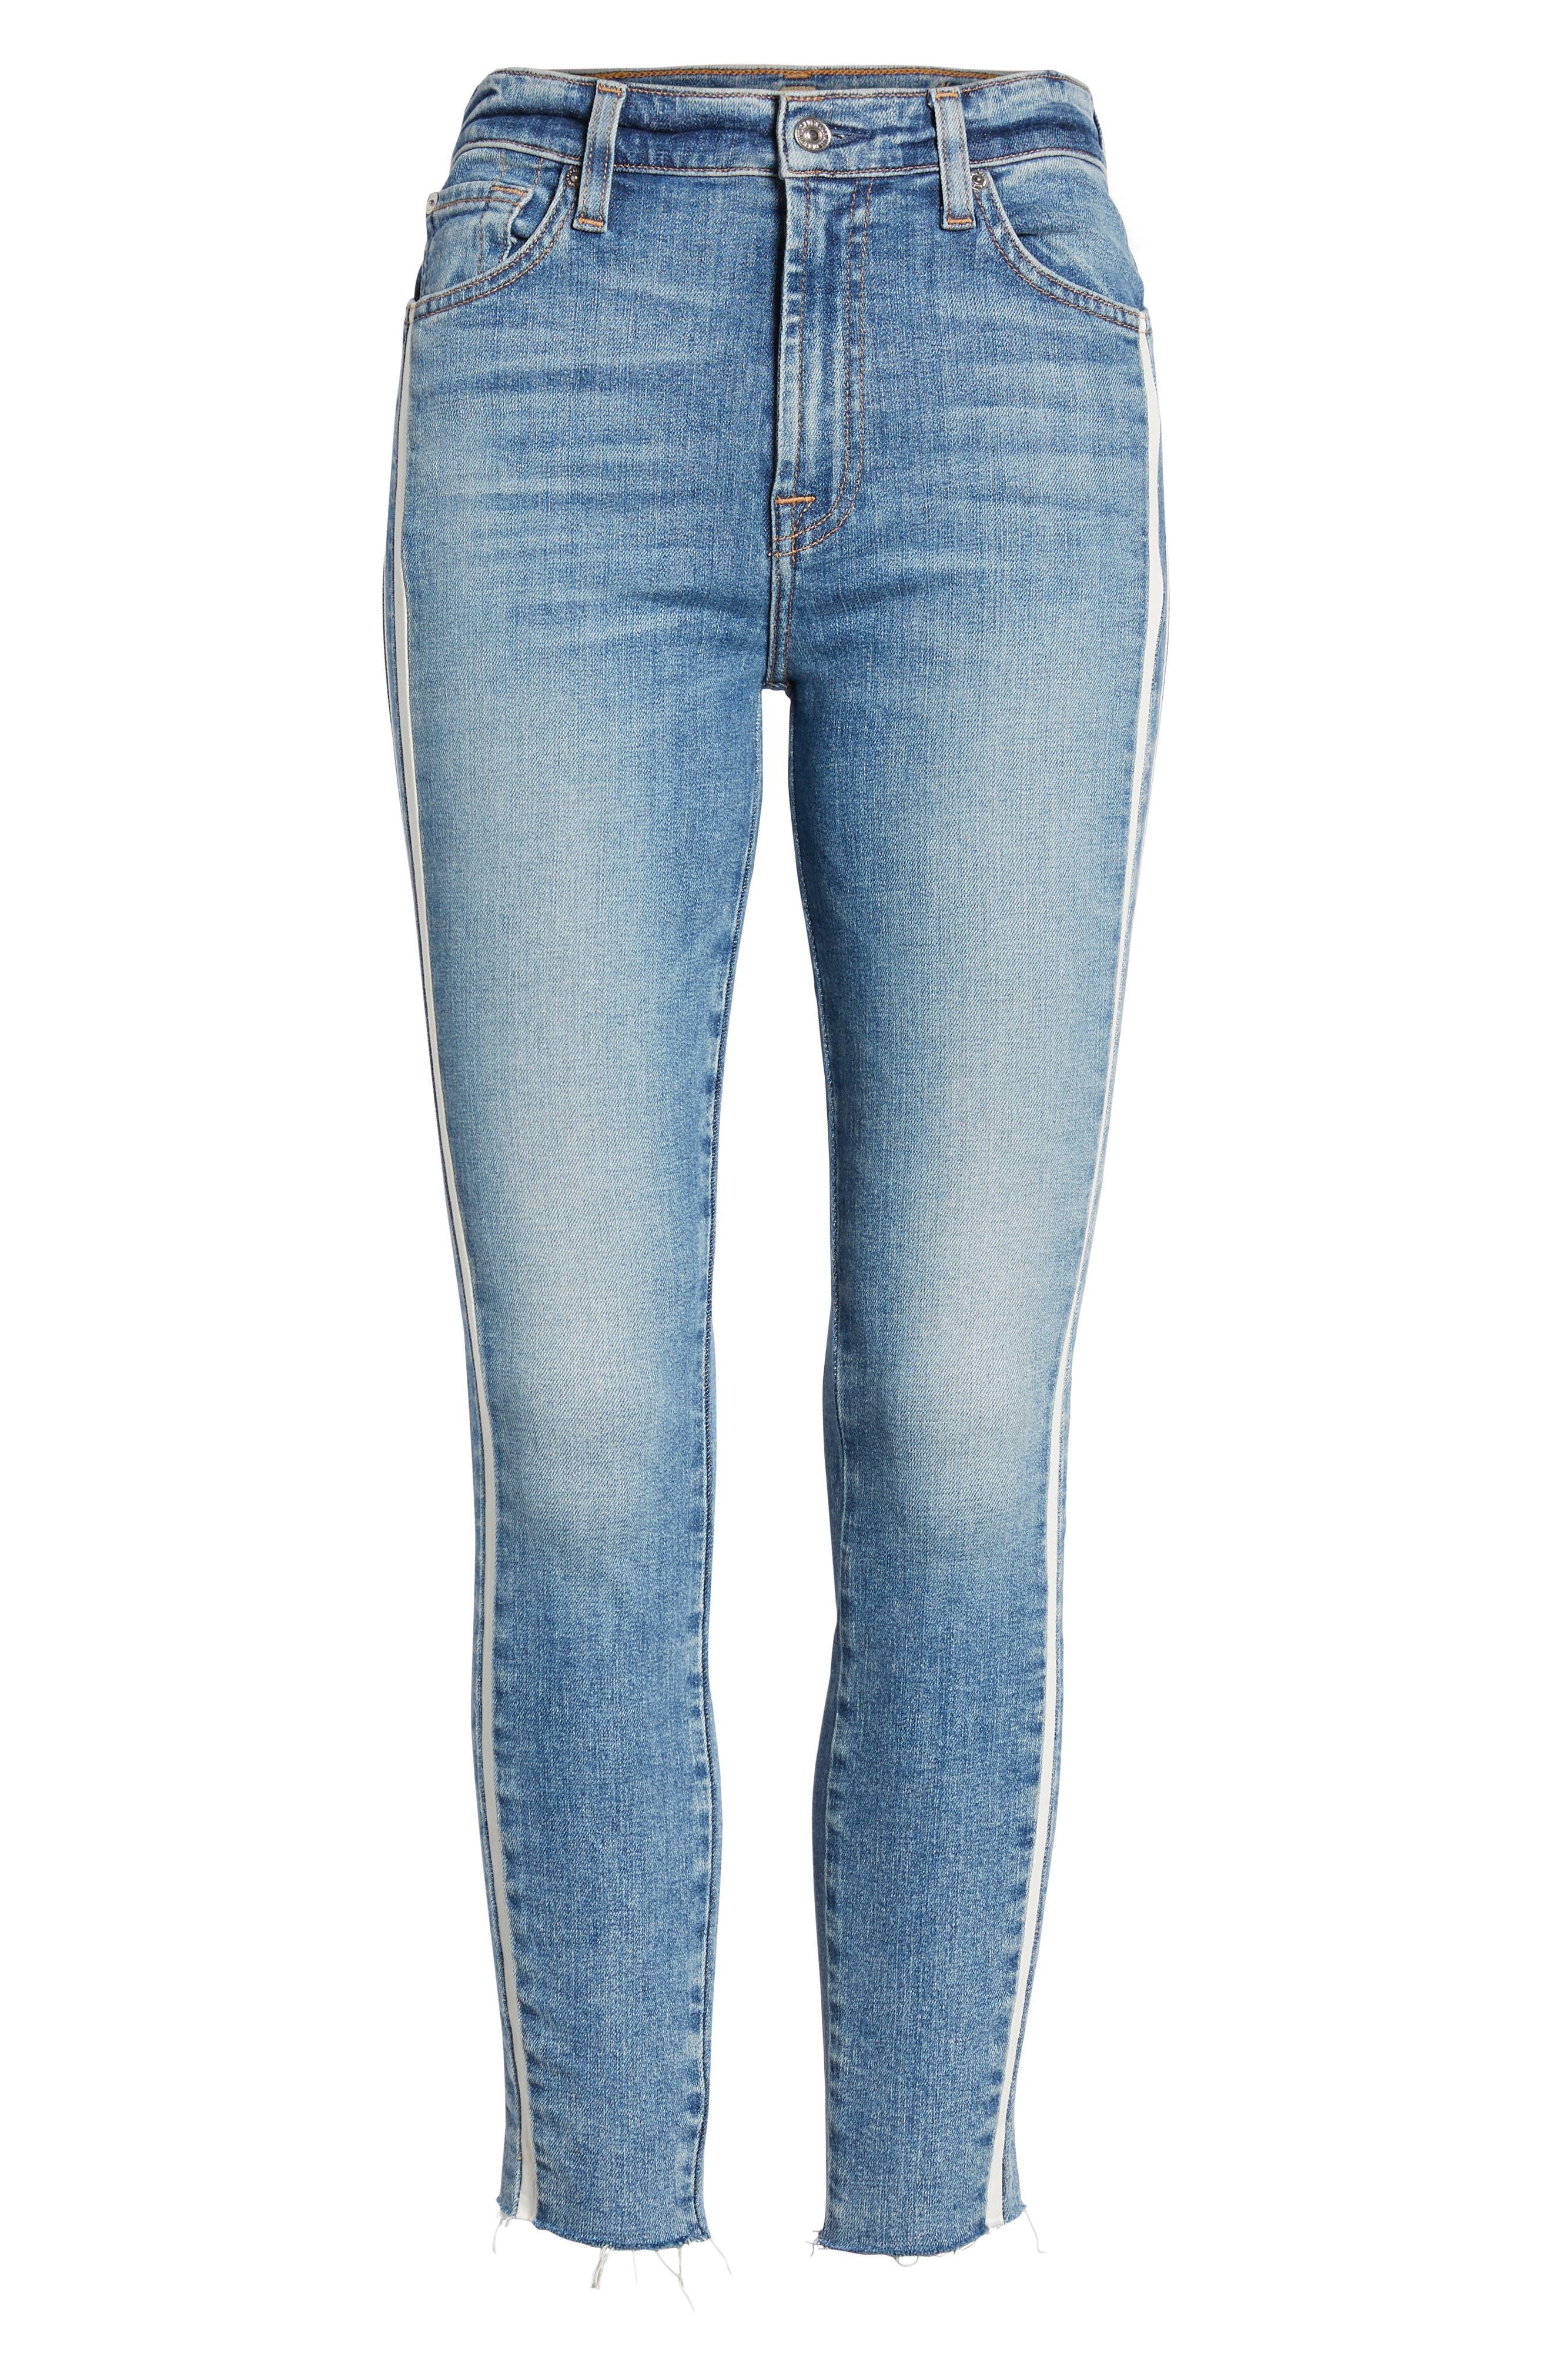 7 FOR ALL MANKIND<SUP>®</SUP>, Side Stripe Ankle Skinny Jeans, Alternate thumbnail 7, color, SLOANE VINTAGE